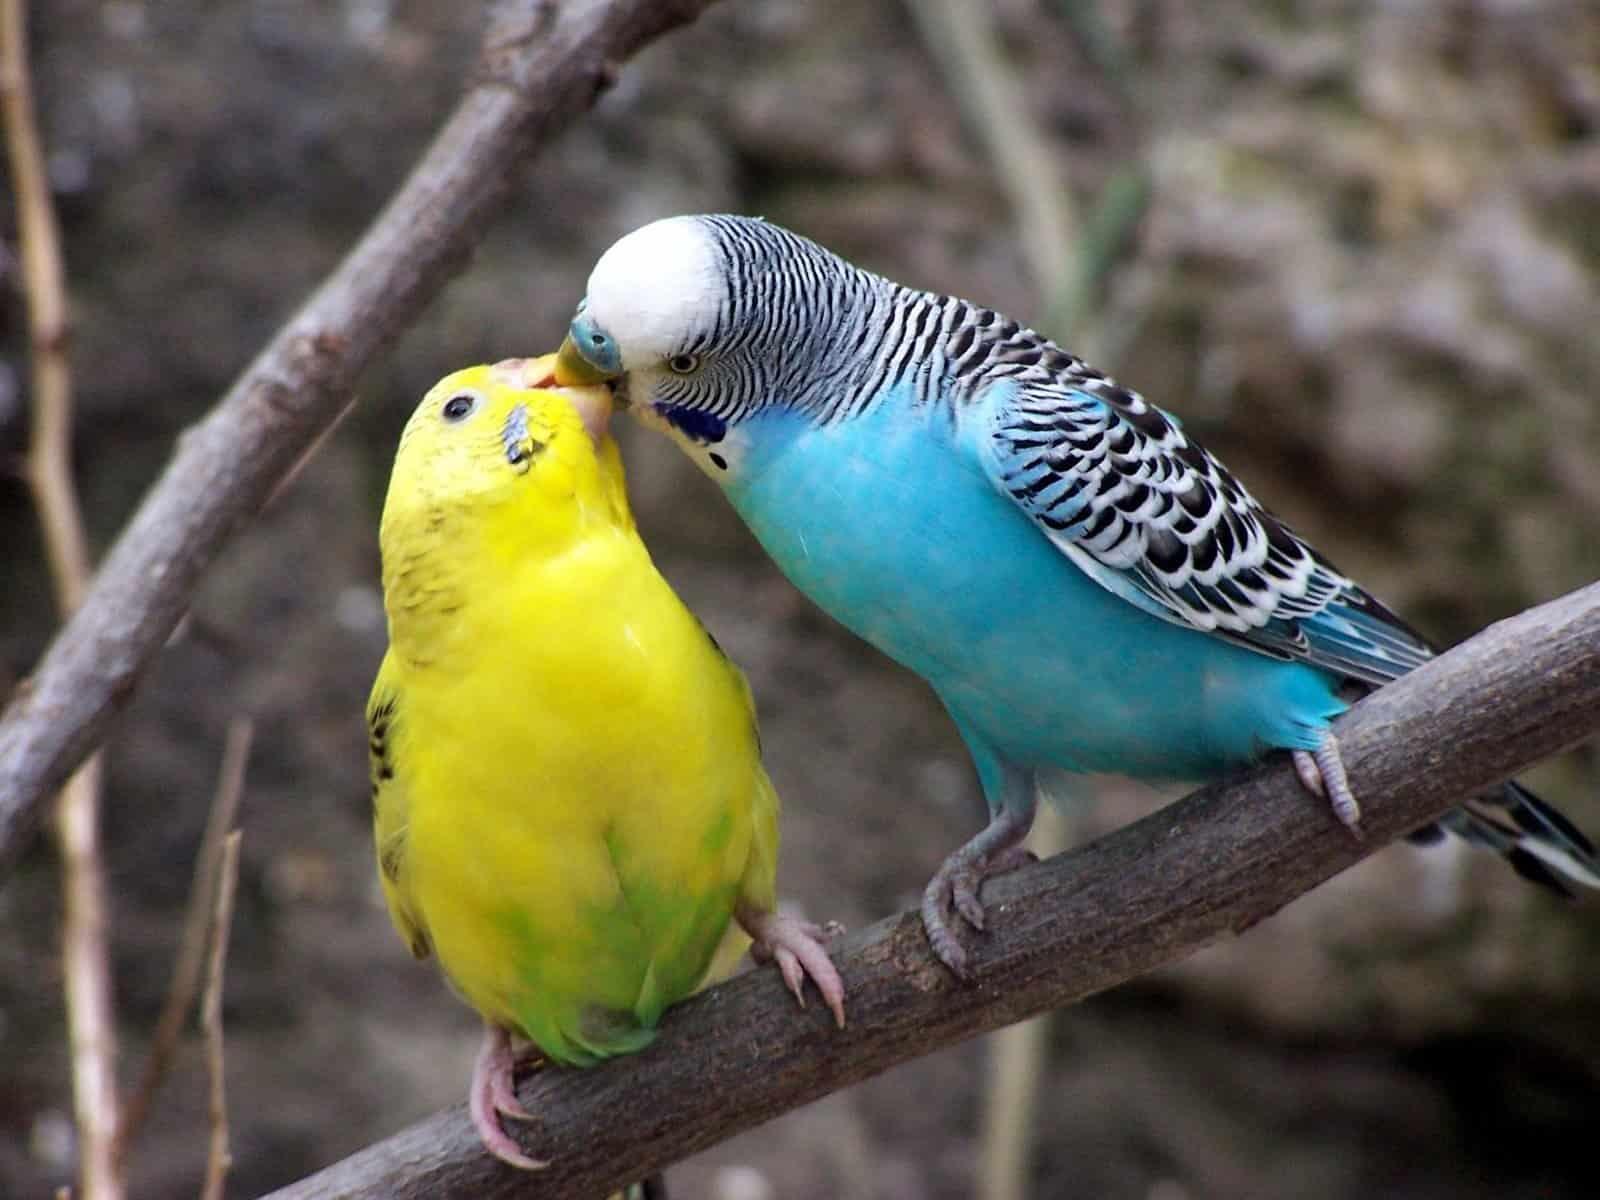 Parakeet Behavior and Sounds: How to Understand Your Pet Bird